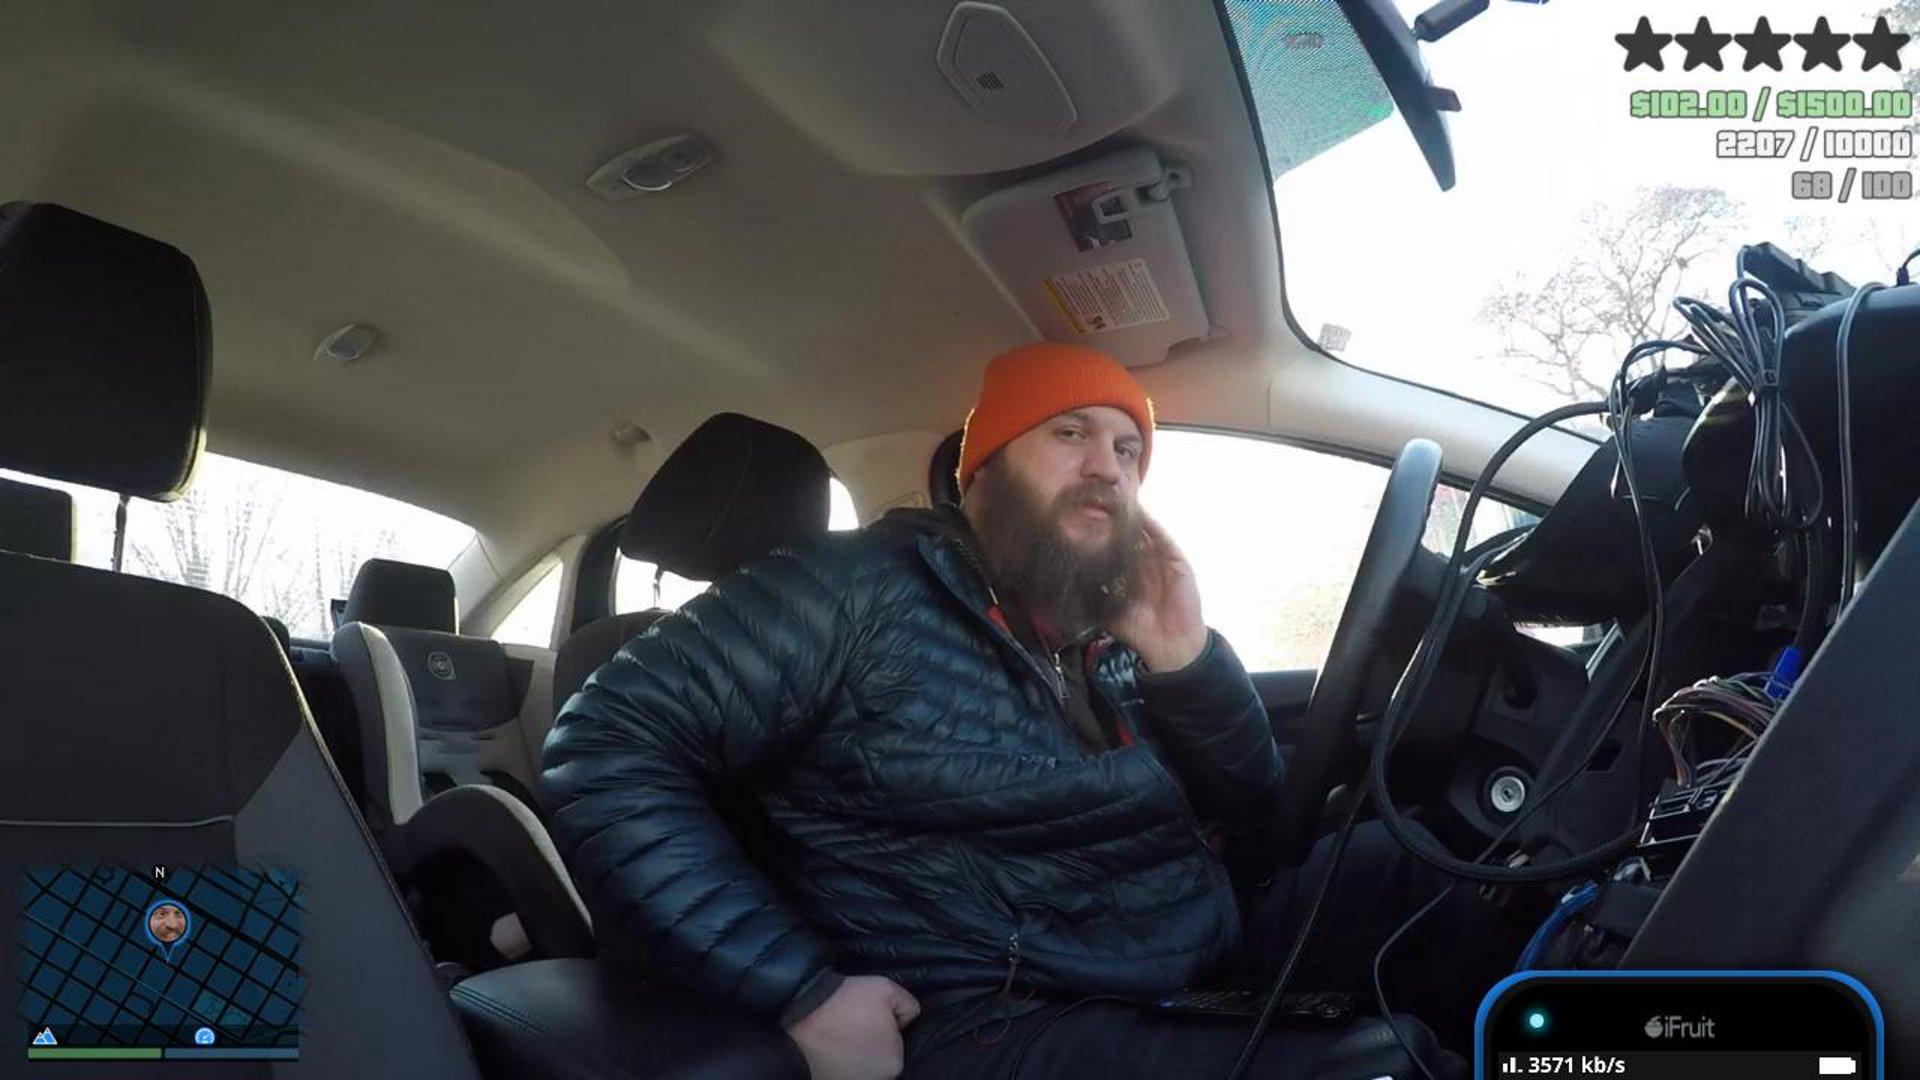 helping-copixel-with-his-car-stereo-%f0%9f%98%81%f0%9f%91%8d-travel-outdoors-0259-https-t-co-ln7fewfoew-https-t-co-b6qhnjcgvz